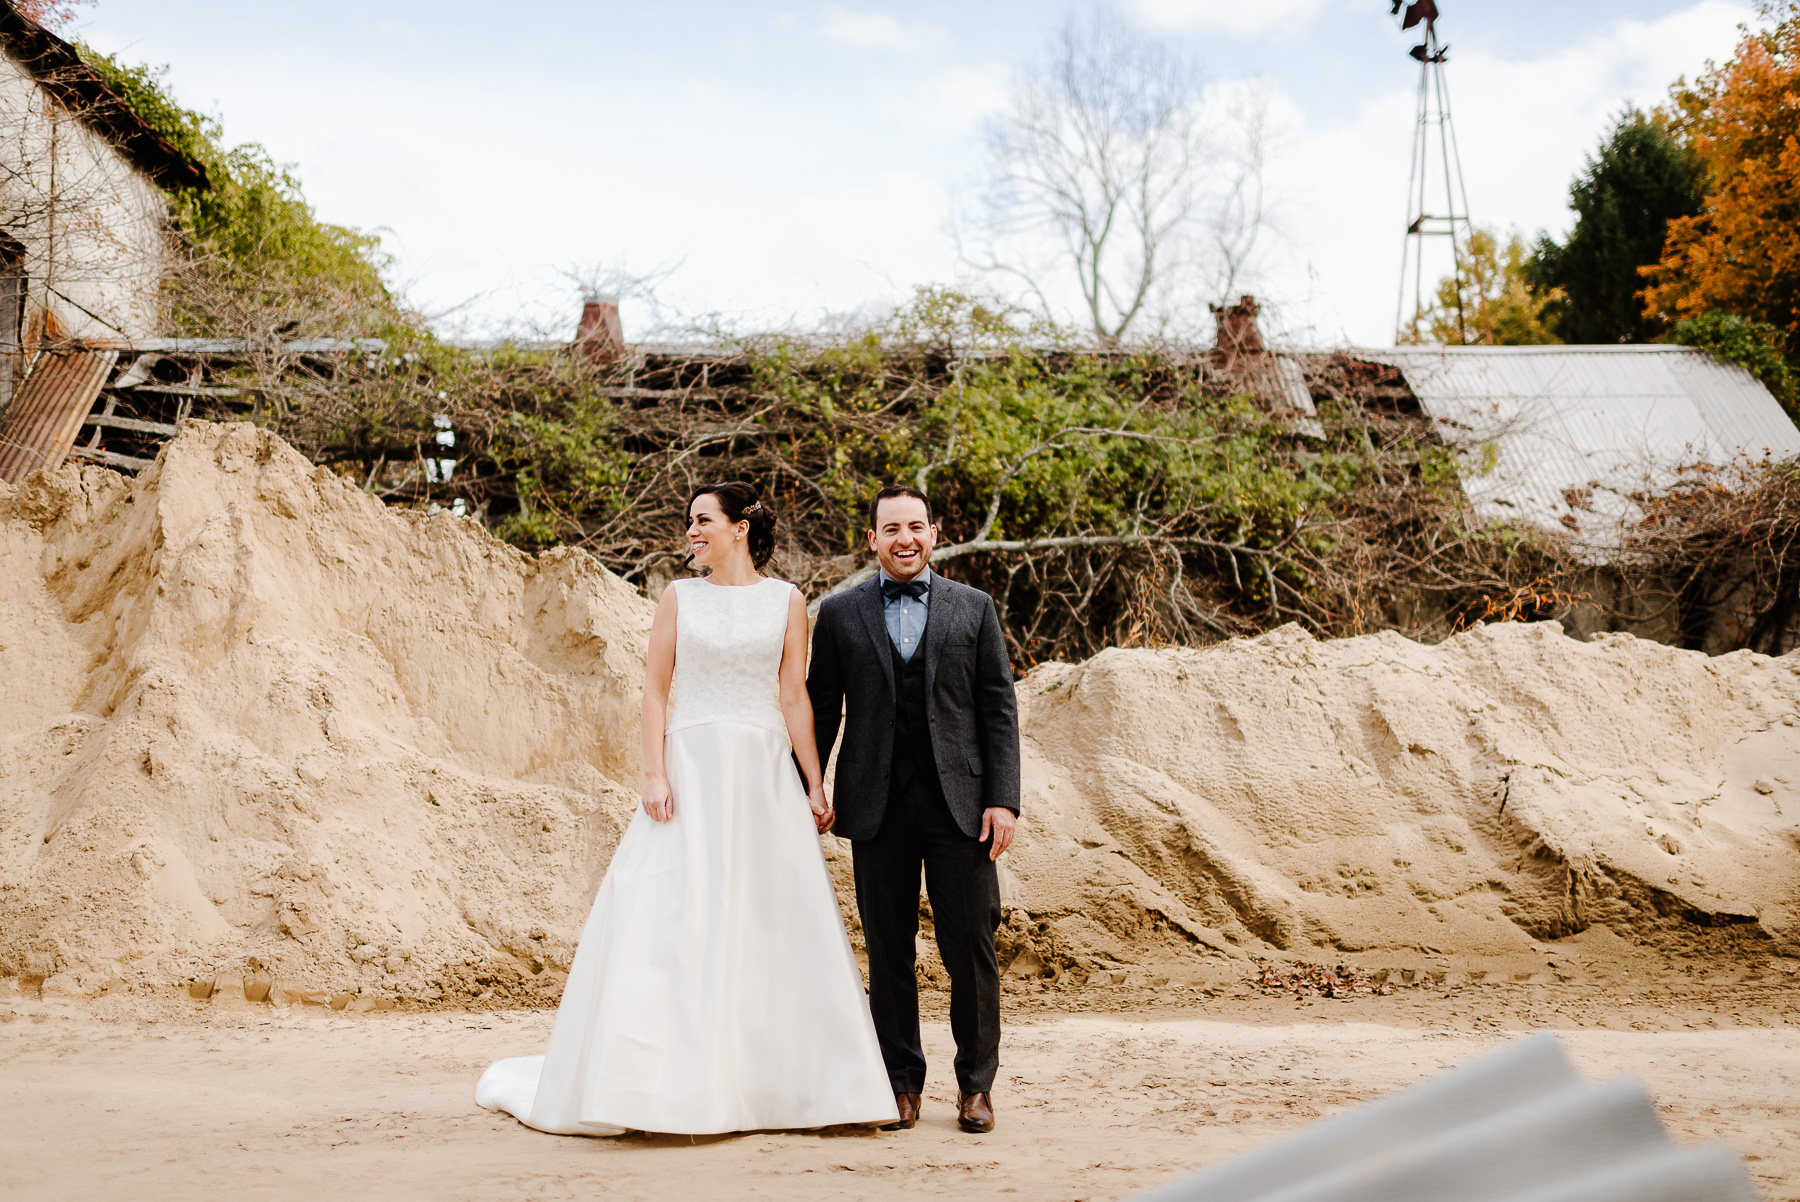 38-Laurita Winery Wedding New Jersey Wedding Photographer Laurita Winery Weddings Longbrook Photography.jpg